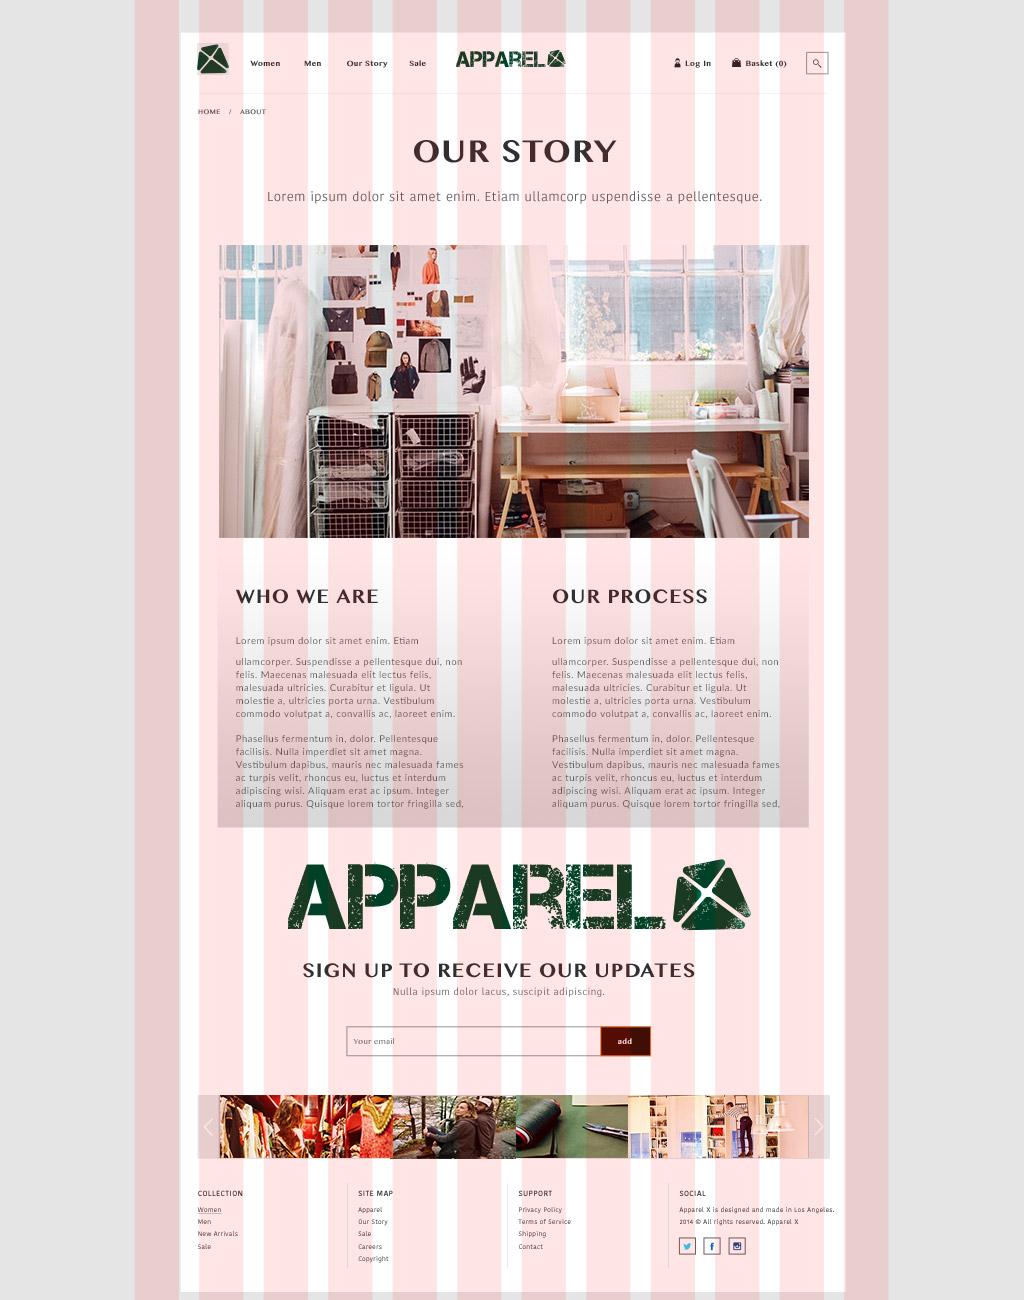 FINAL.final.apparel.x.our_story.jpg